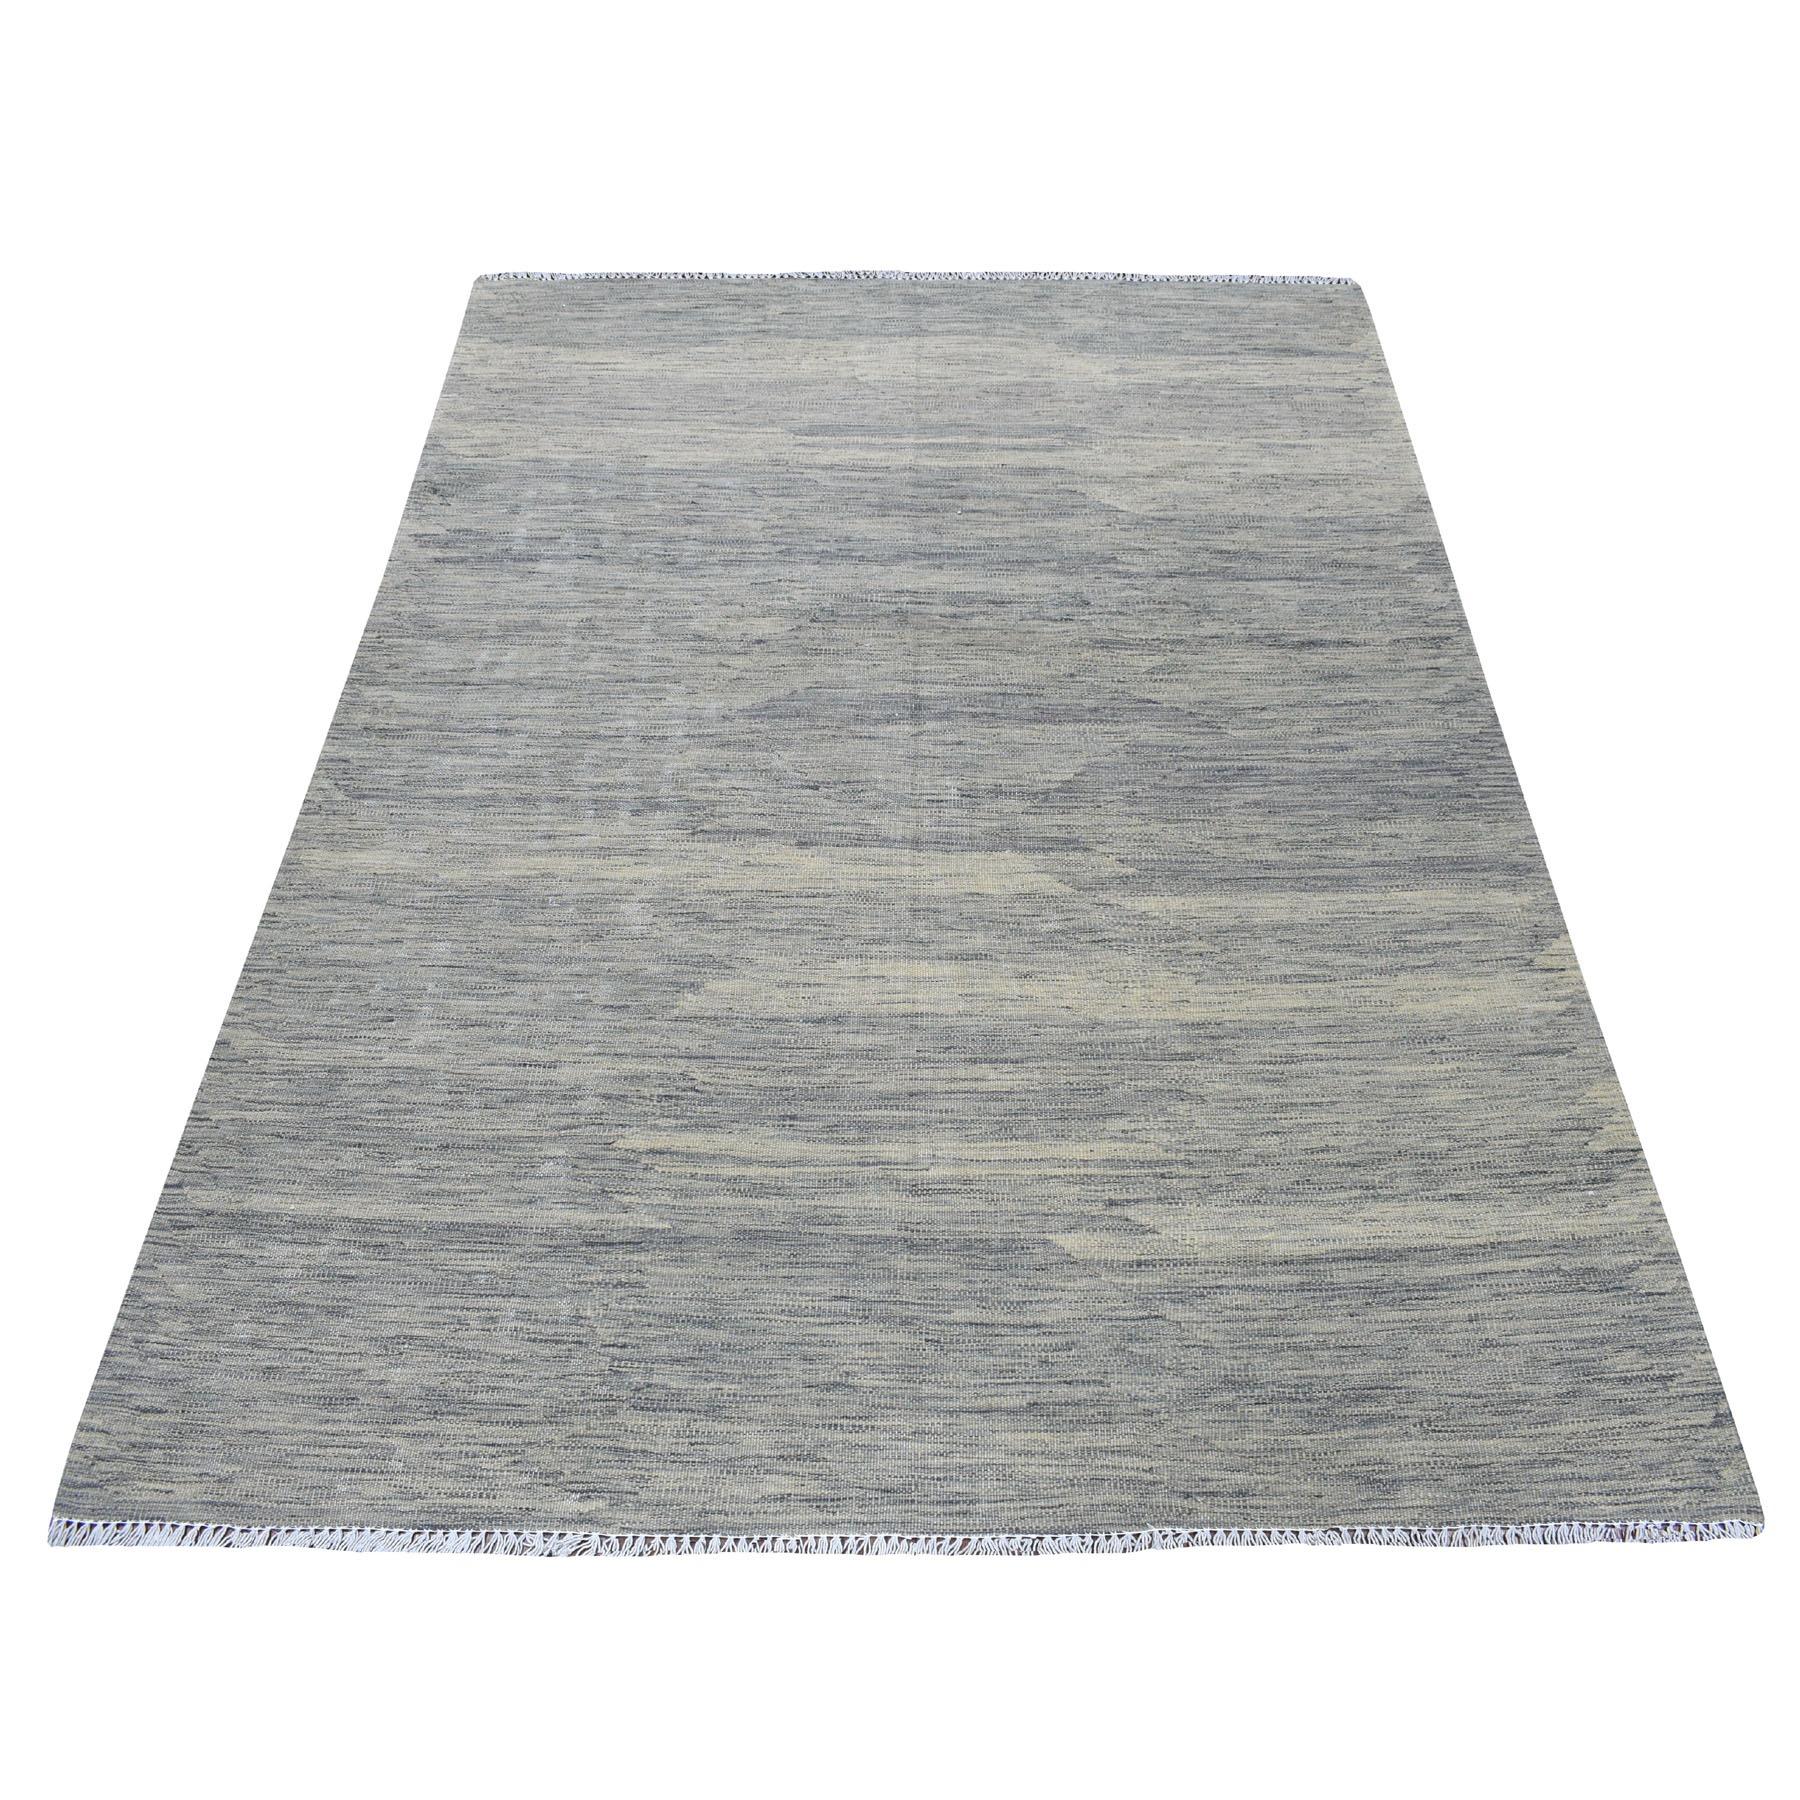 Fine Kilim Collection Hand Woven Grey Rug No: 01108452